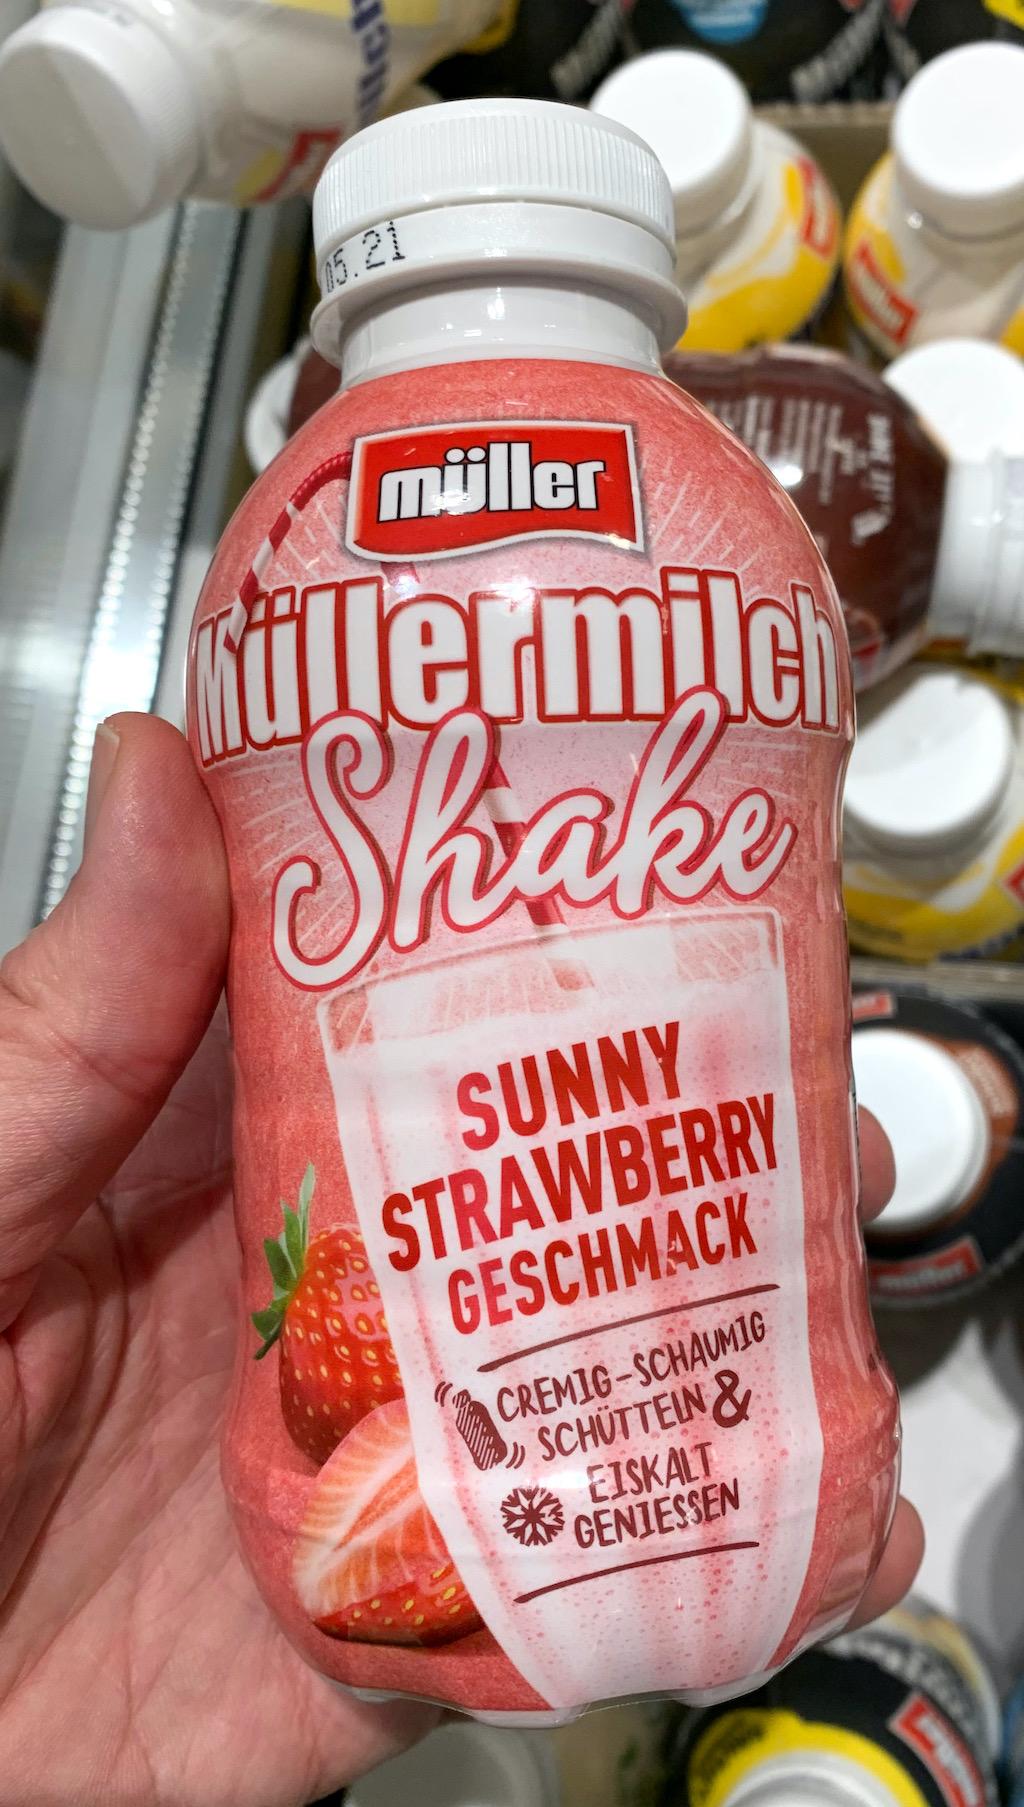 Müllermilch Shake Sunny Strawbery Geschmack